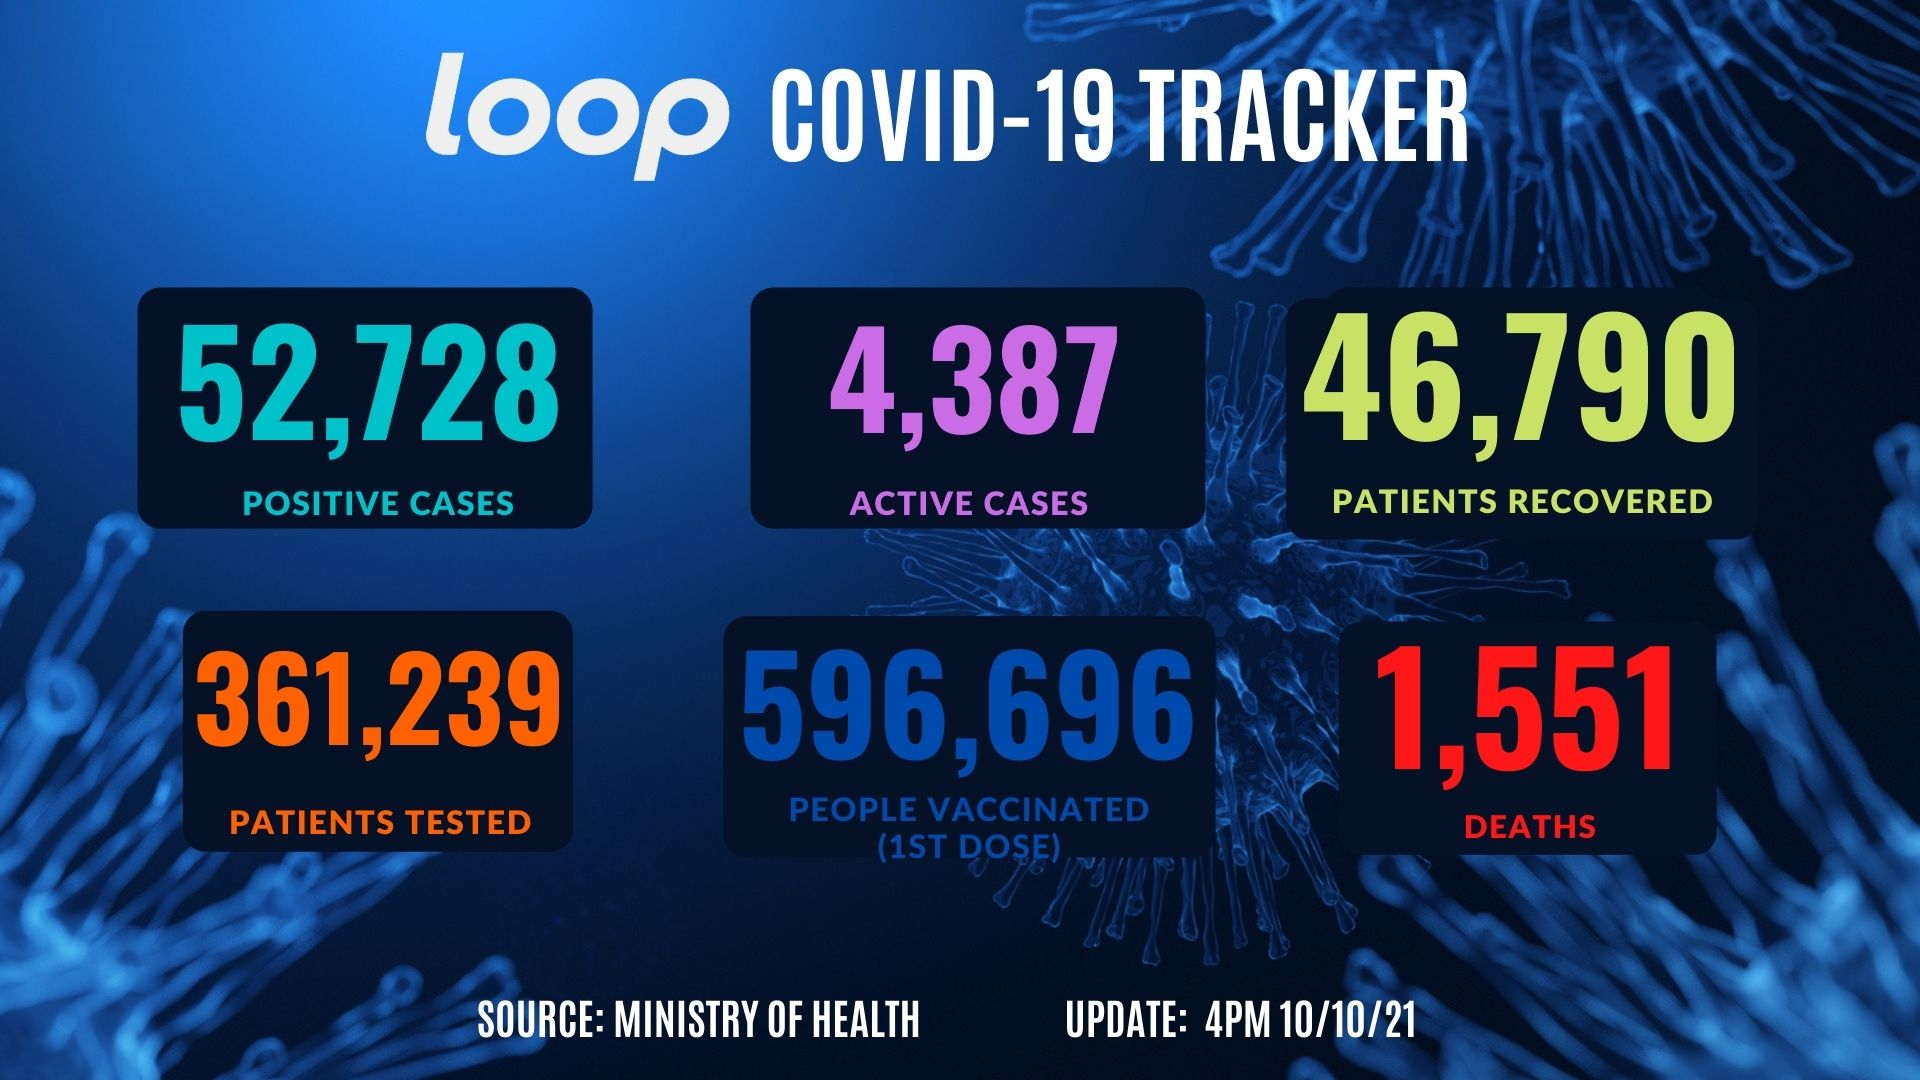 Loop COVID-19 tracker.